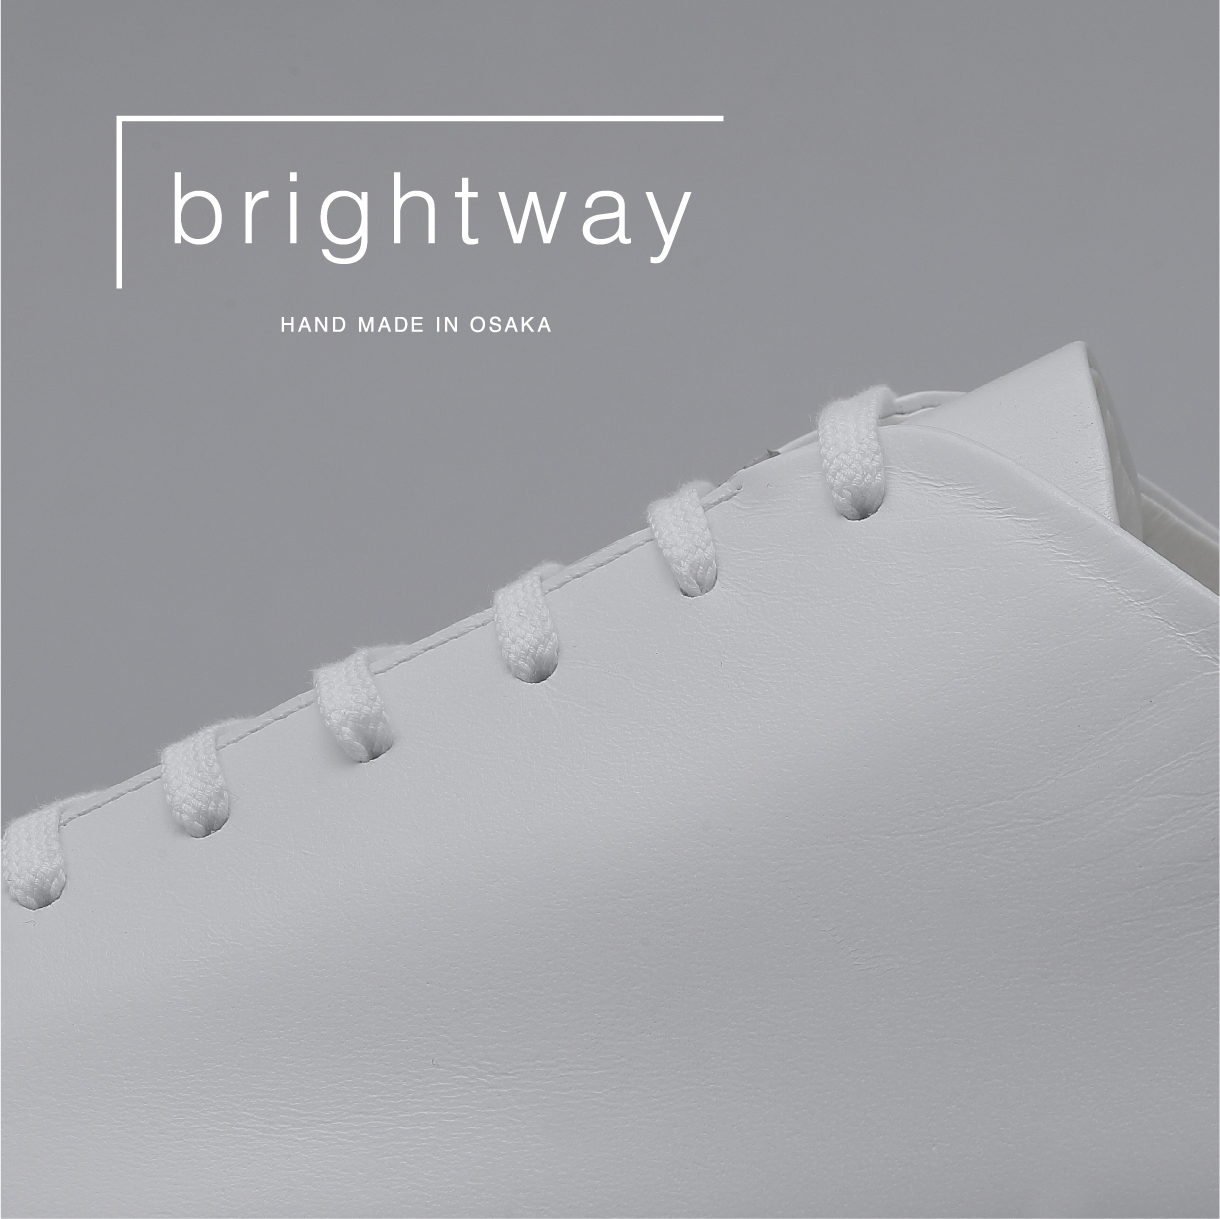 brightwayの取扱店舗一覧